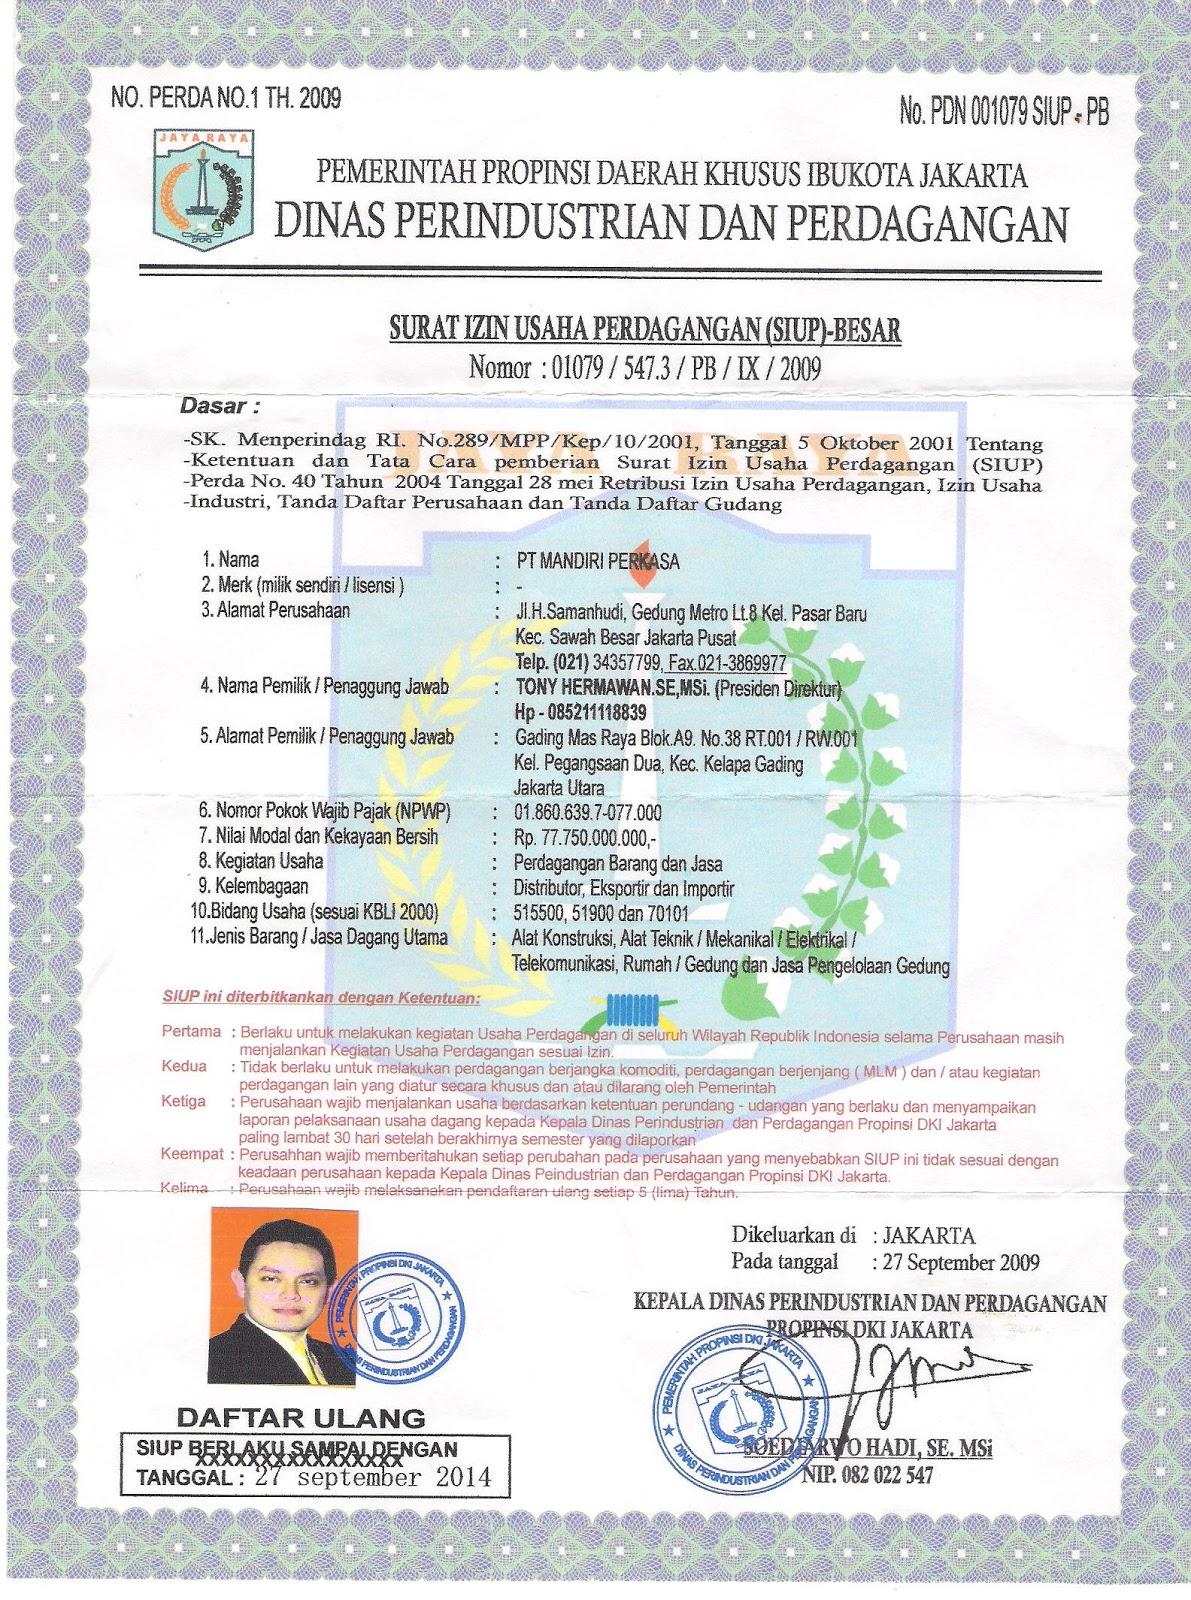 Contoh Daftar Makanan Dan Minuman Di Restoran Masakan Korea Wikipedia Bahasa Indonesia Ensiklopedia Bebas Cara Mudah Membuat Surat Ijin Usaha Perdagangan Siup Guru Madrasah